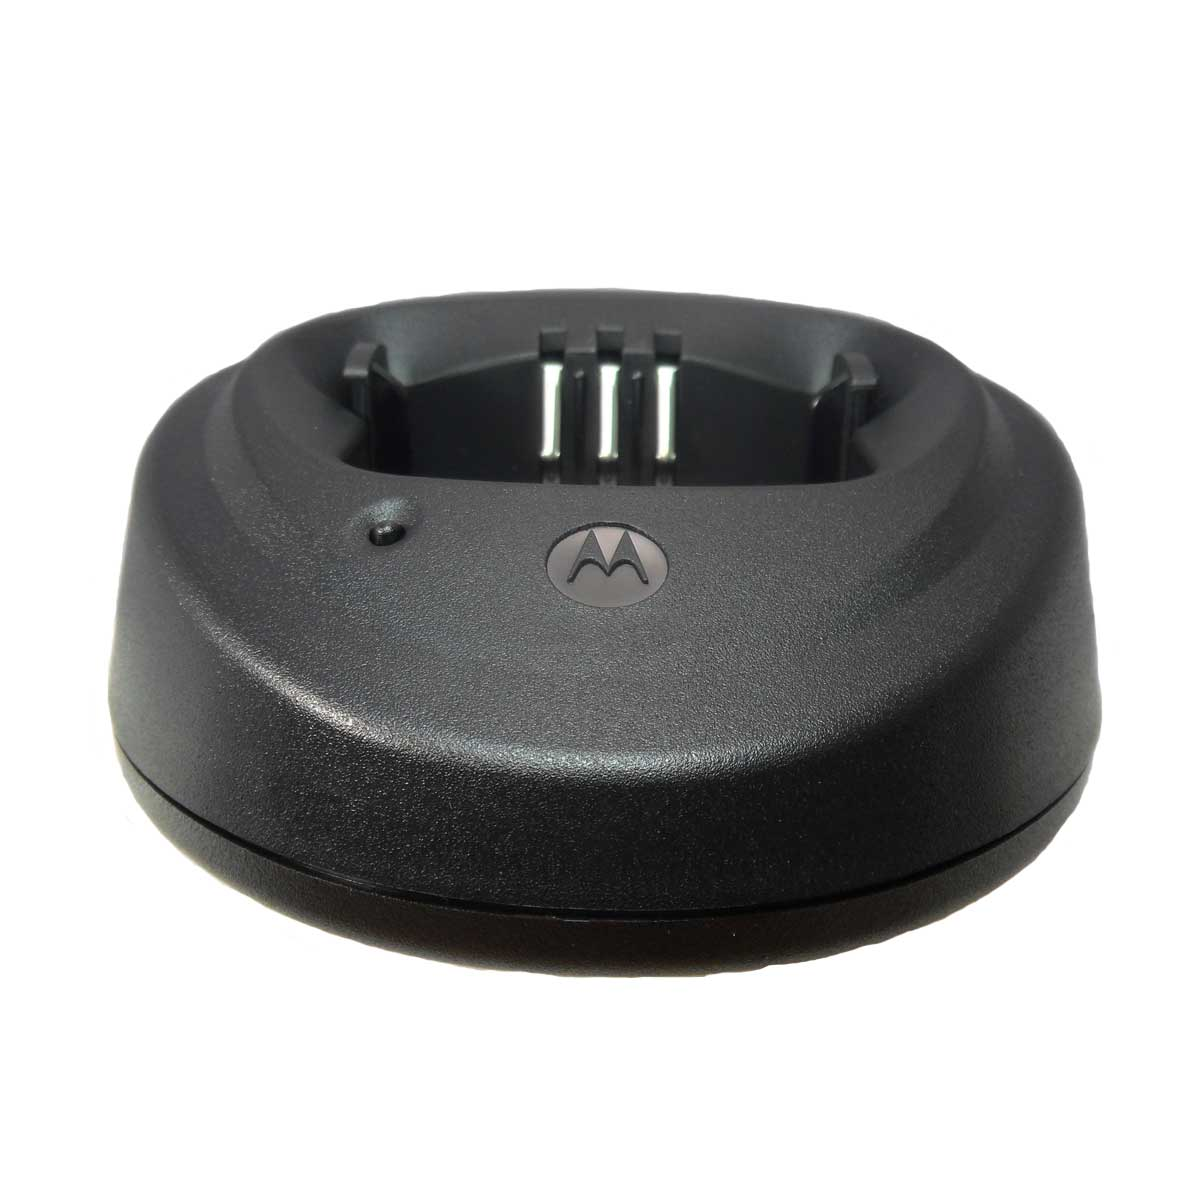 Cargador individual Motorola PMPN4173A para radios